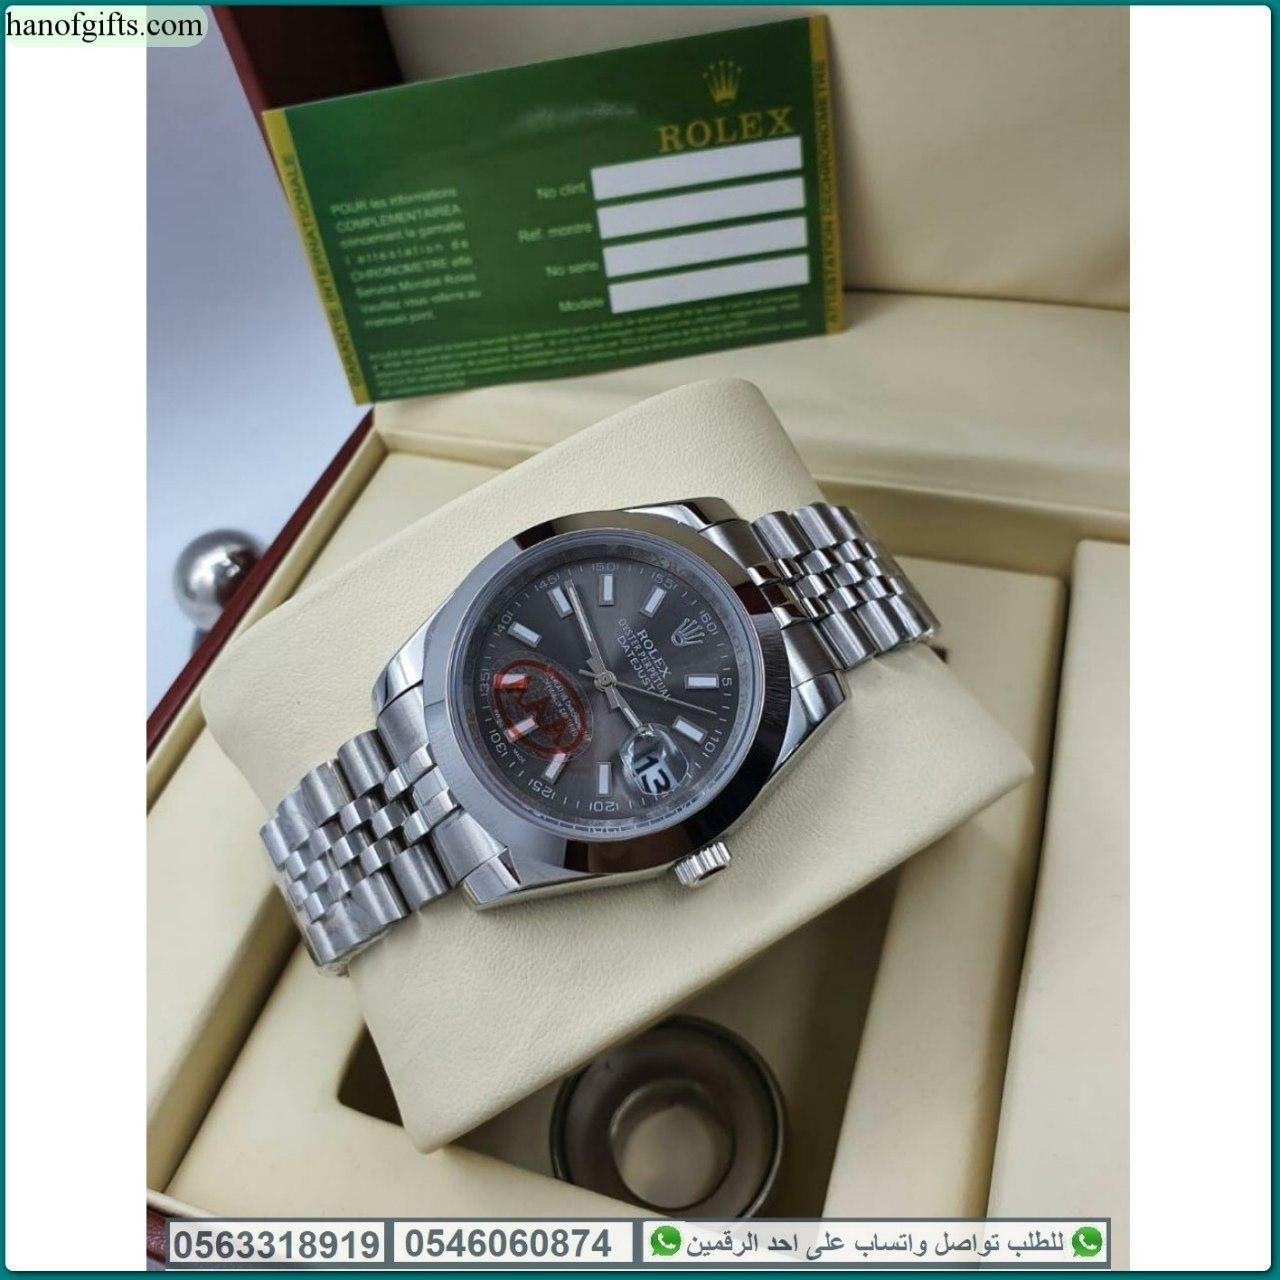 ساعات رولكس رجالي Rolex درجه اولى مع علبه الماركه هدايا هنوف Casio Watch Casio Watches